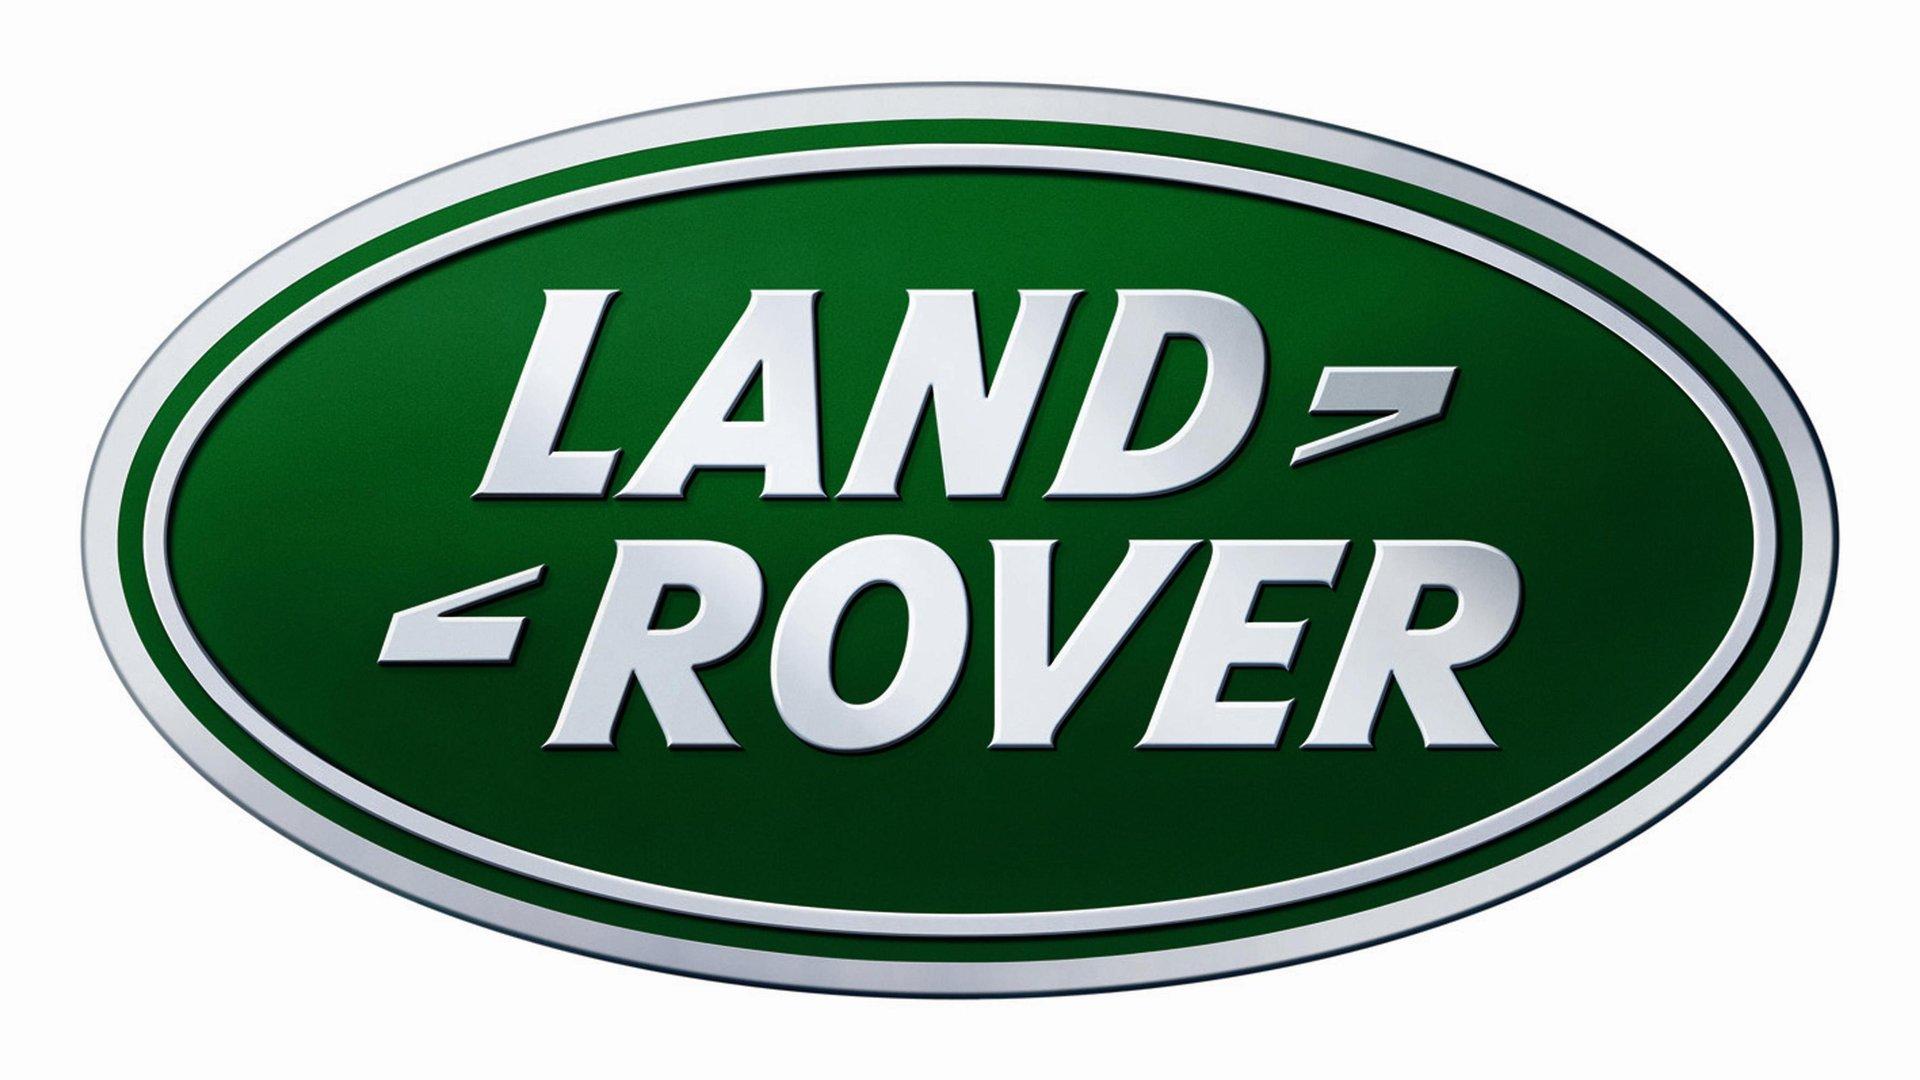 MARMITTE SPORTIVE LAND ROVER - SCARICHI SPORTIVI LAND ROVER